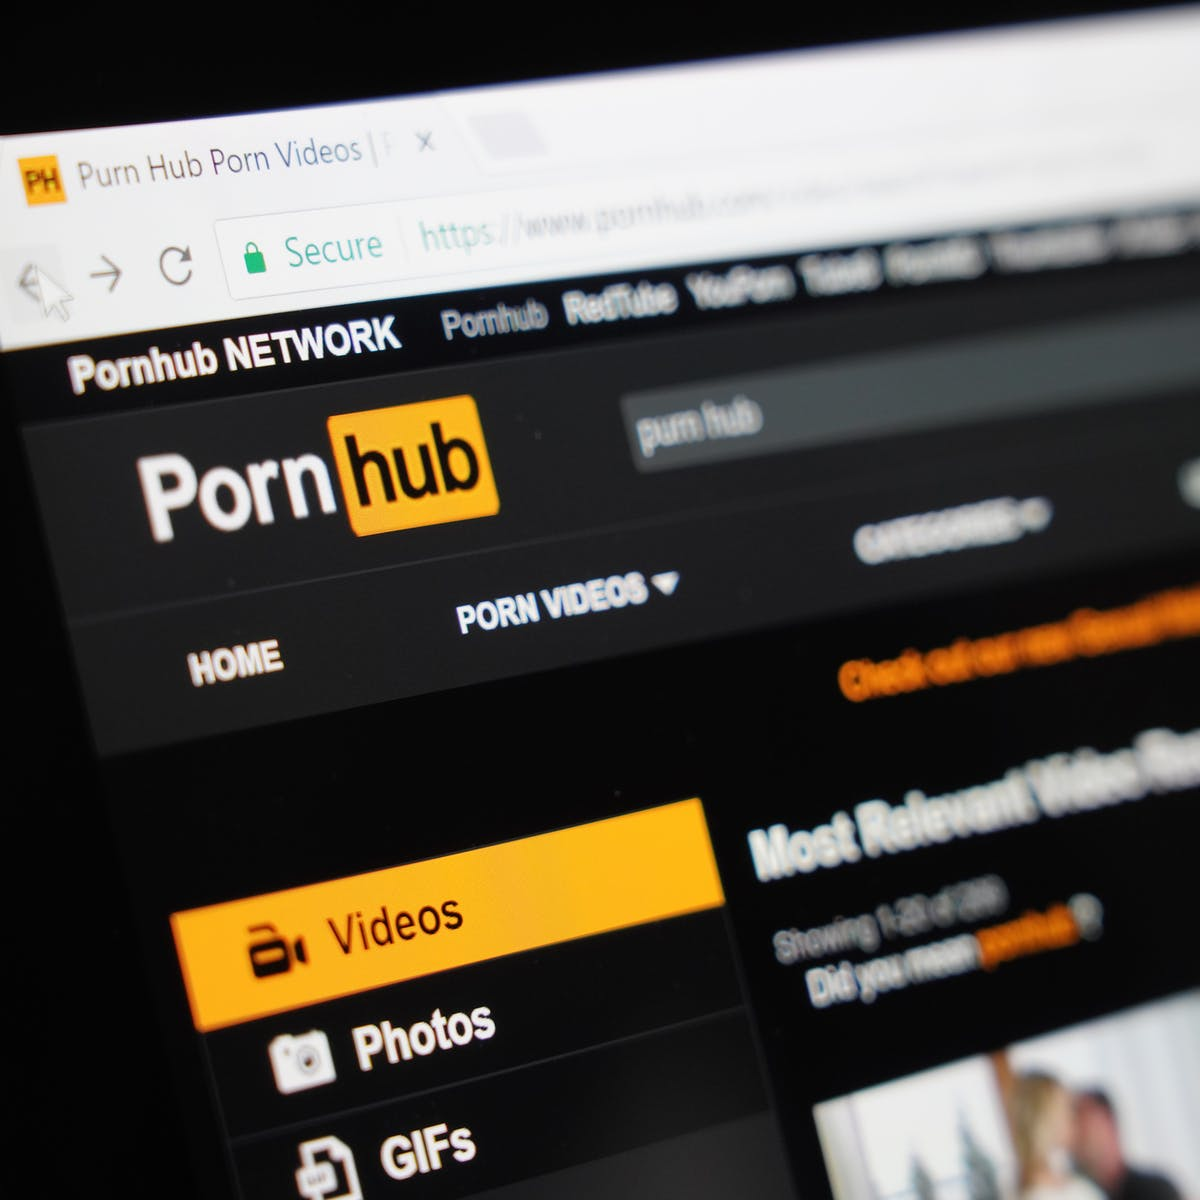 Application Porn ai can now create fake porn, making revenge porn even more